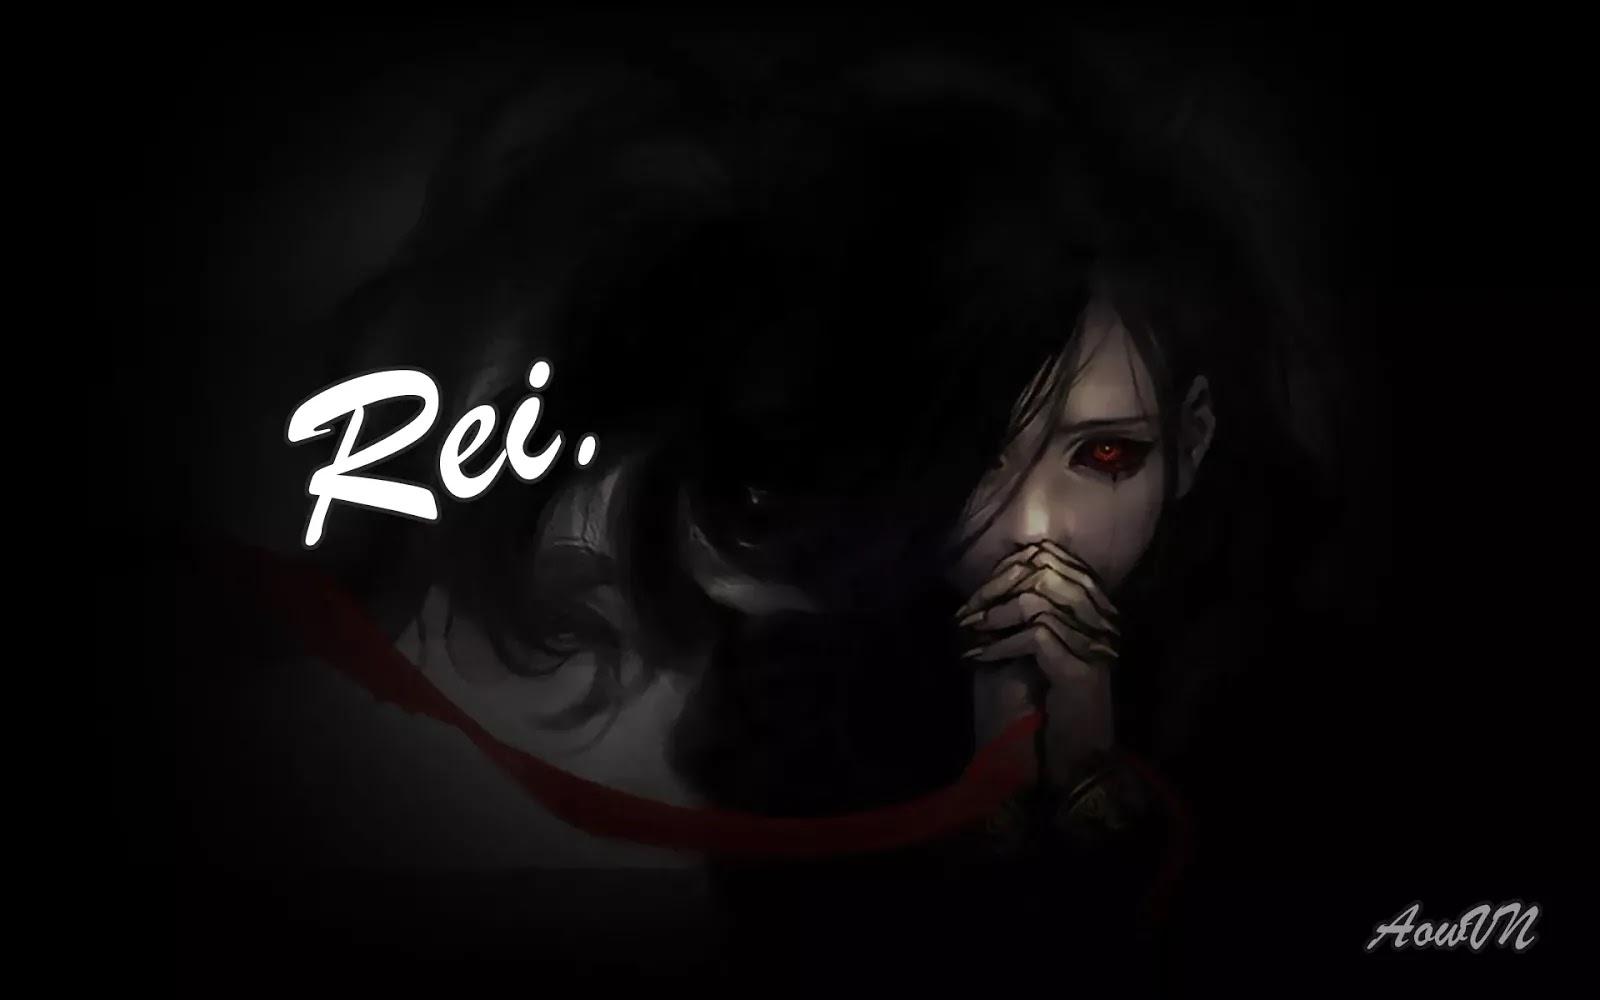 AowVN.org game andorid viet hoa m%2B%25281%2529 - [HOT] Lời Nguyền Rei Việt Hóa | Game Android Nhật Kinh Dị - Jusou Zero